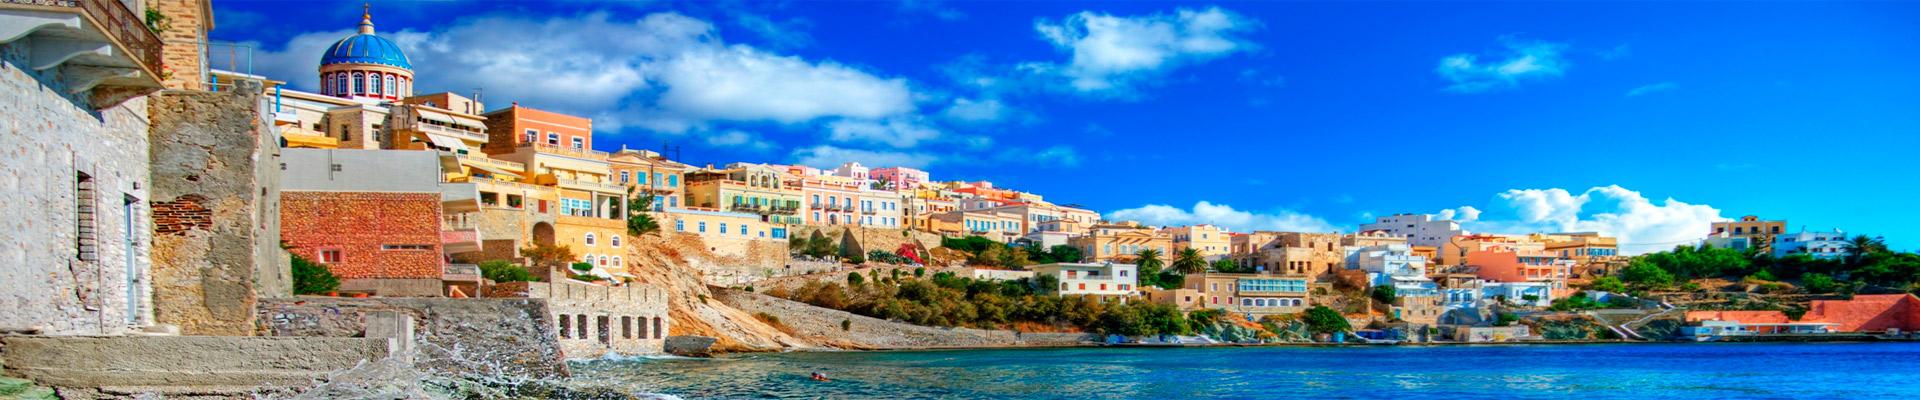 Ilhas Gregas e Turquia Completa